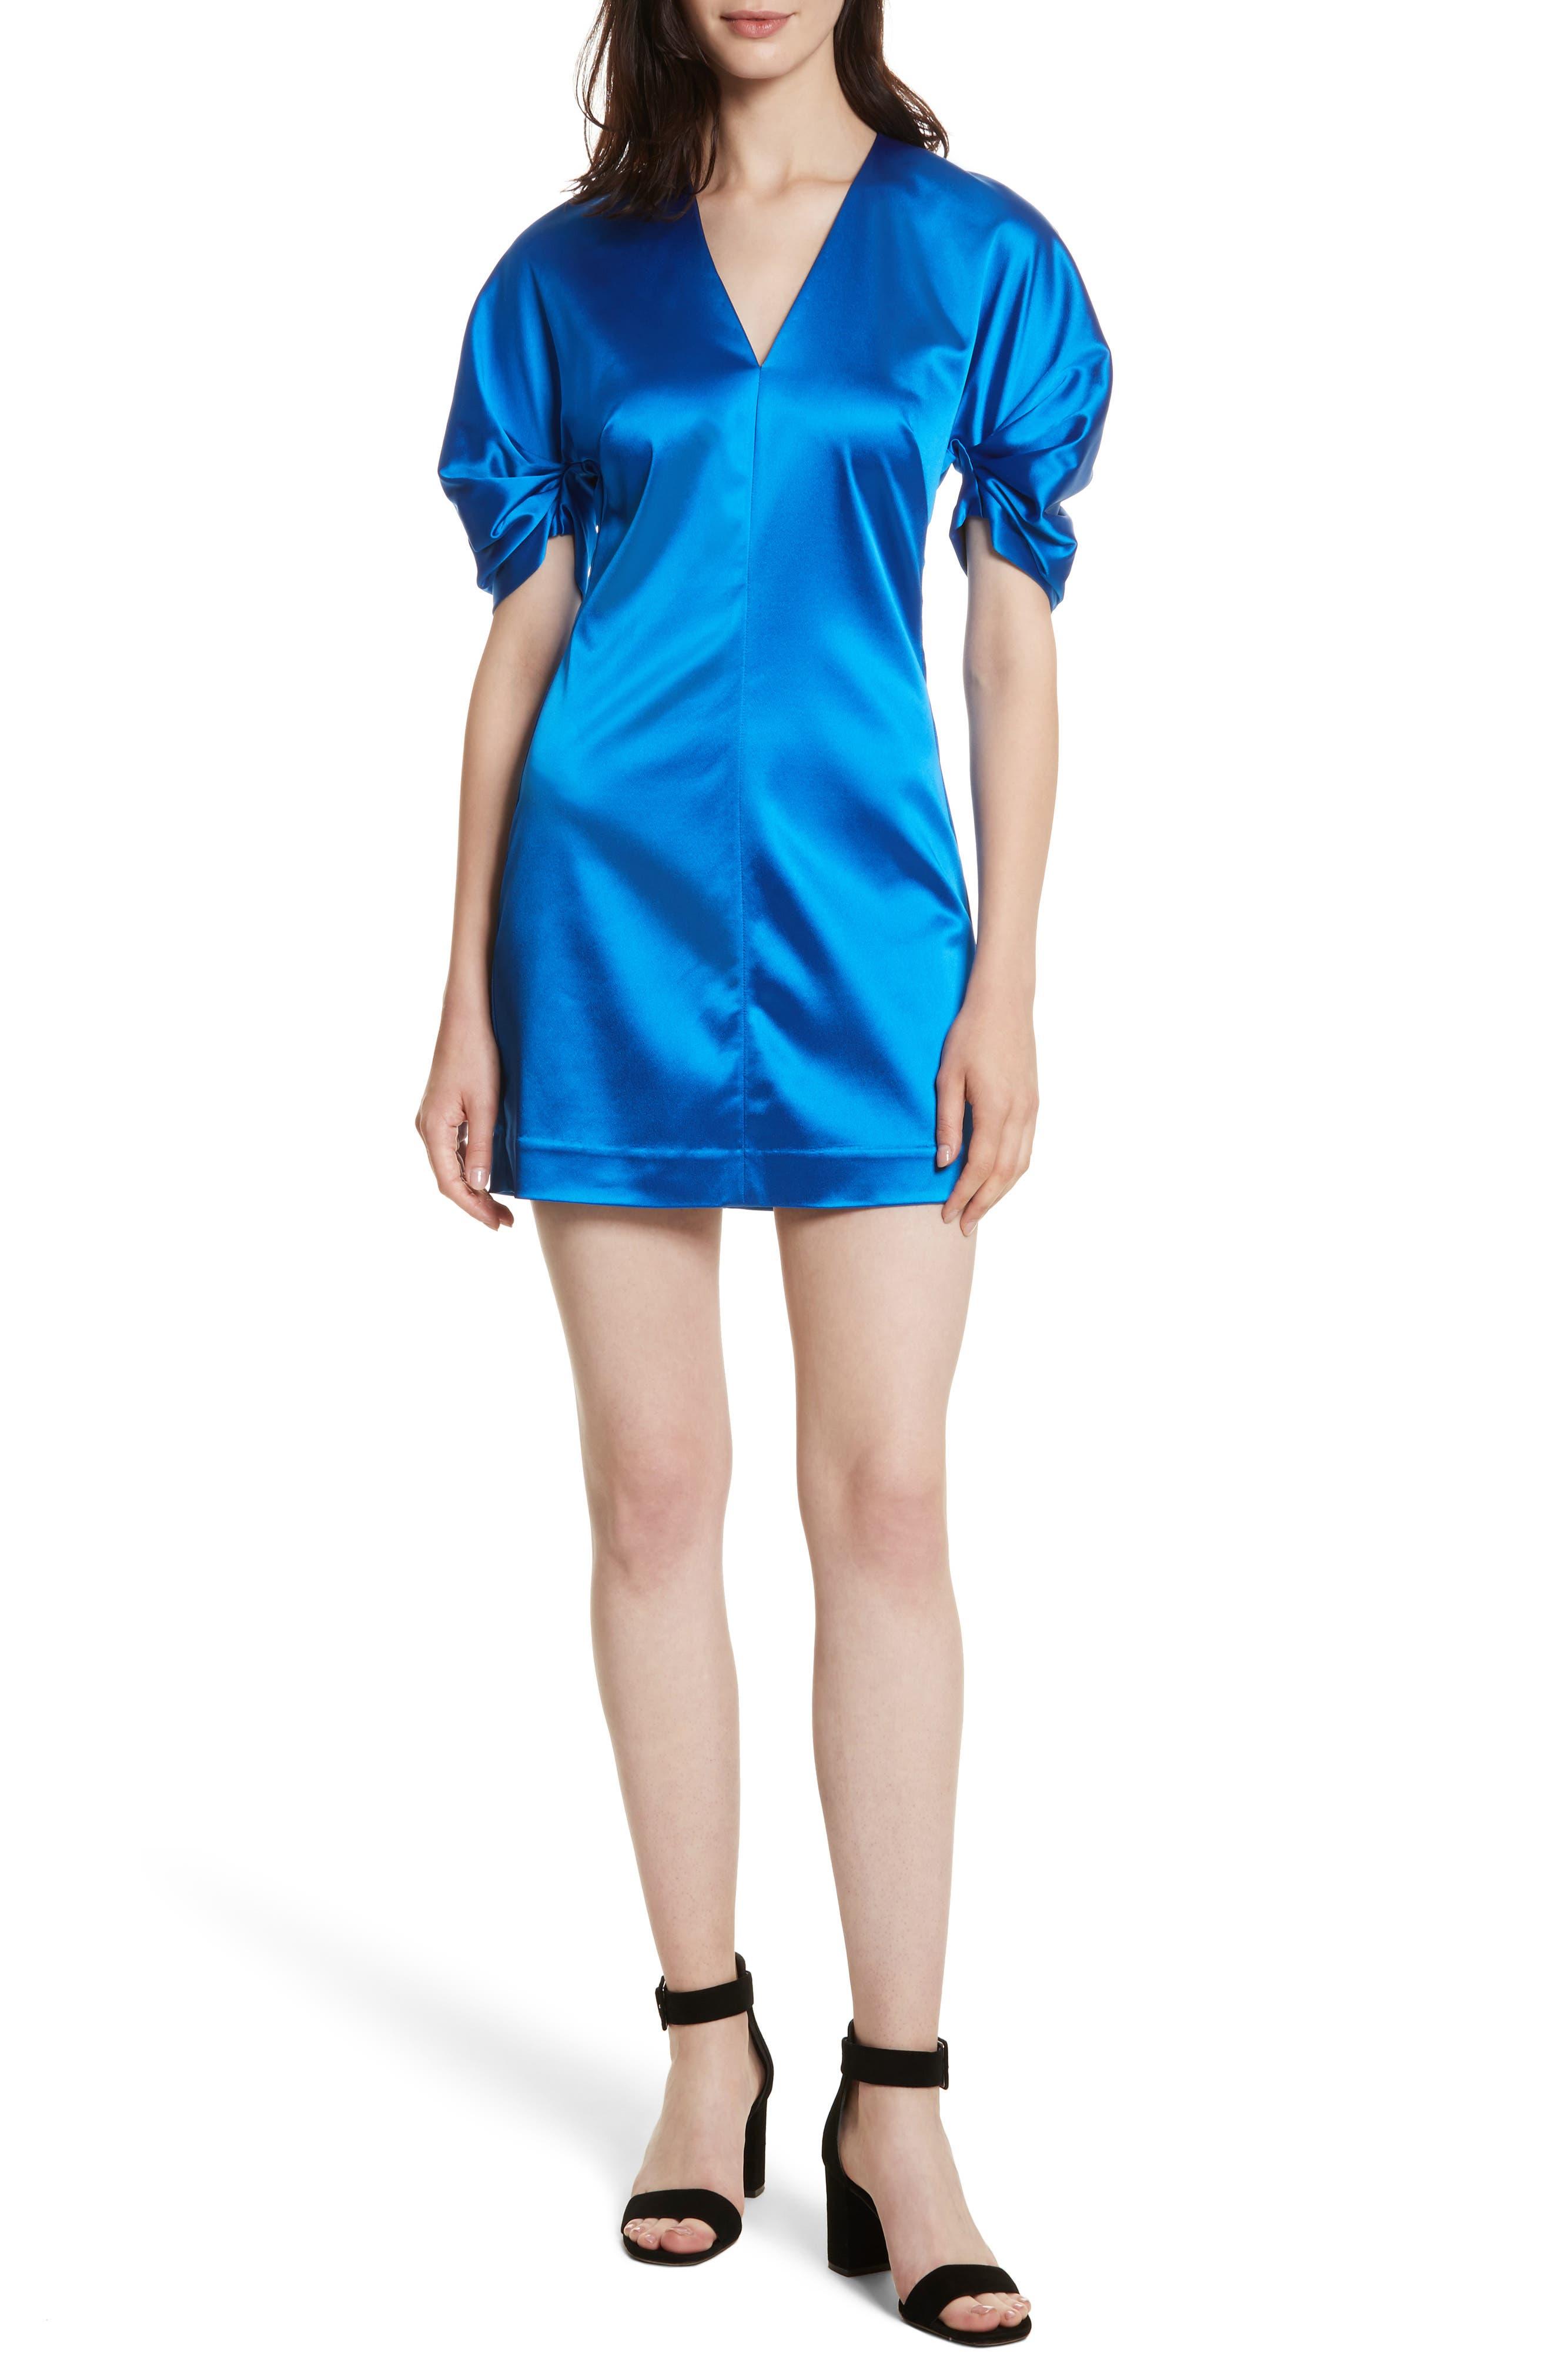 Sloan Duchess Satin Dress,                             Main thumbnail 1, color,                             435